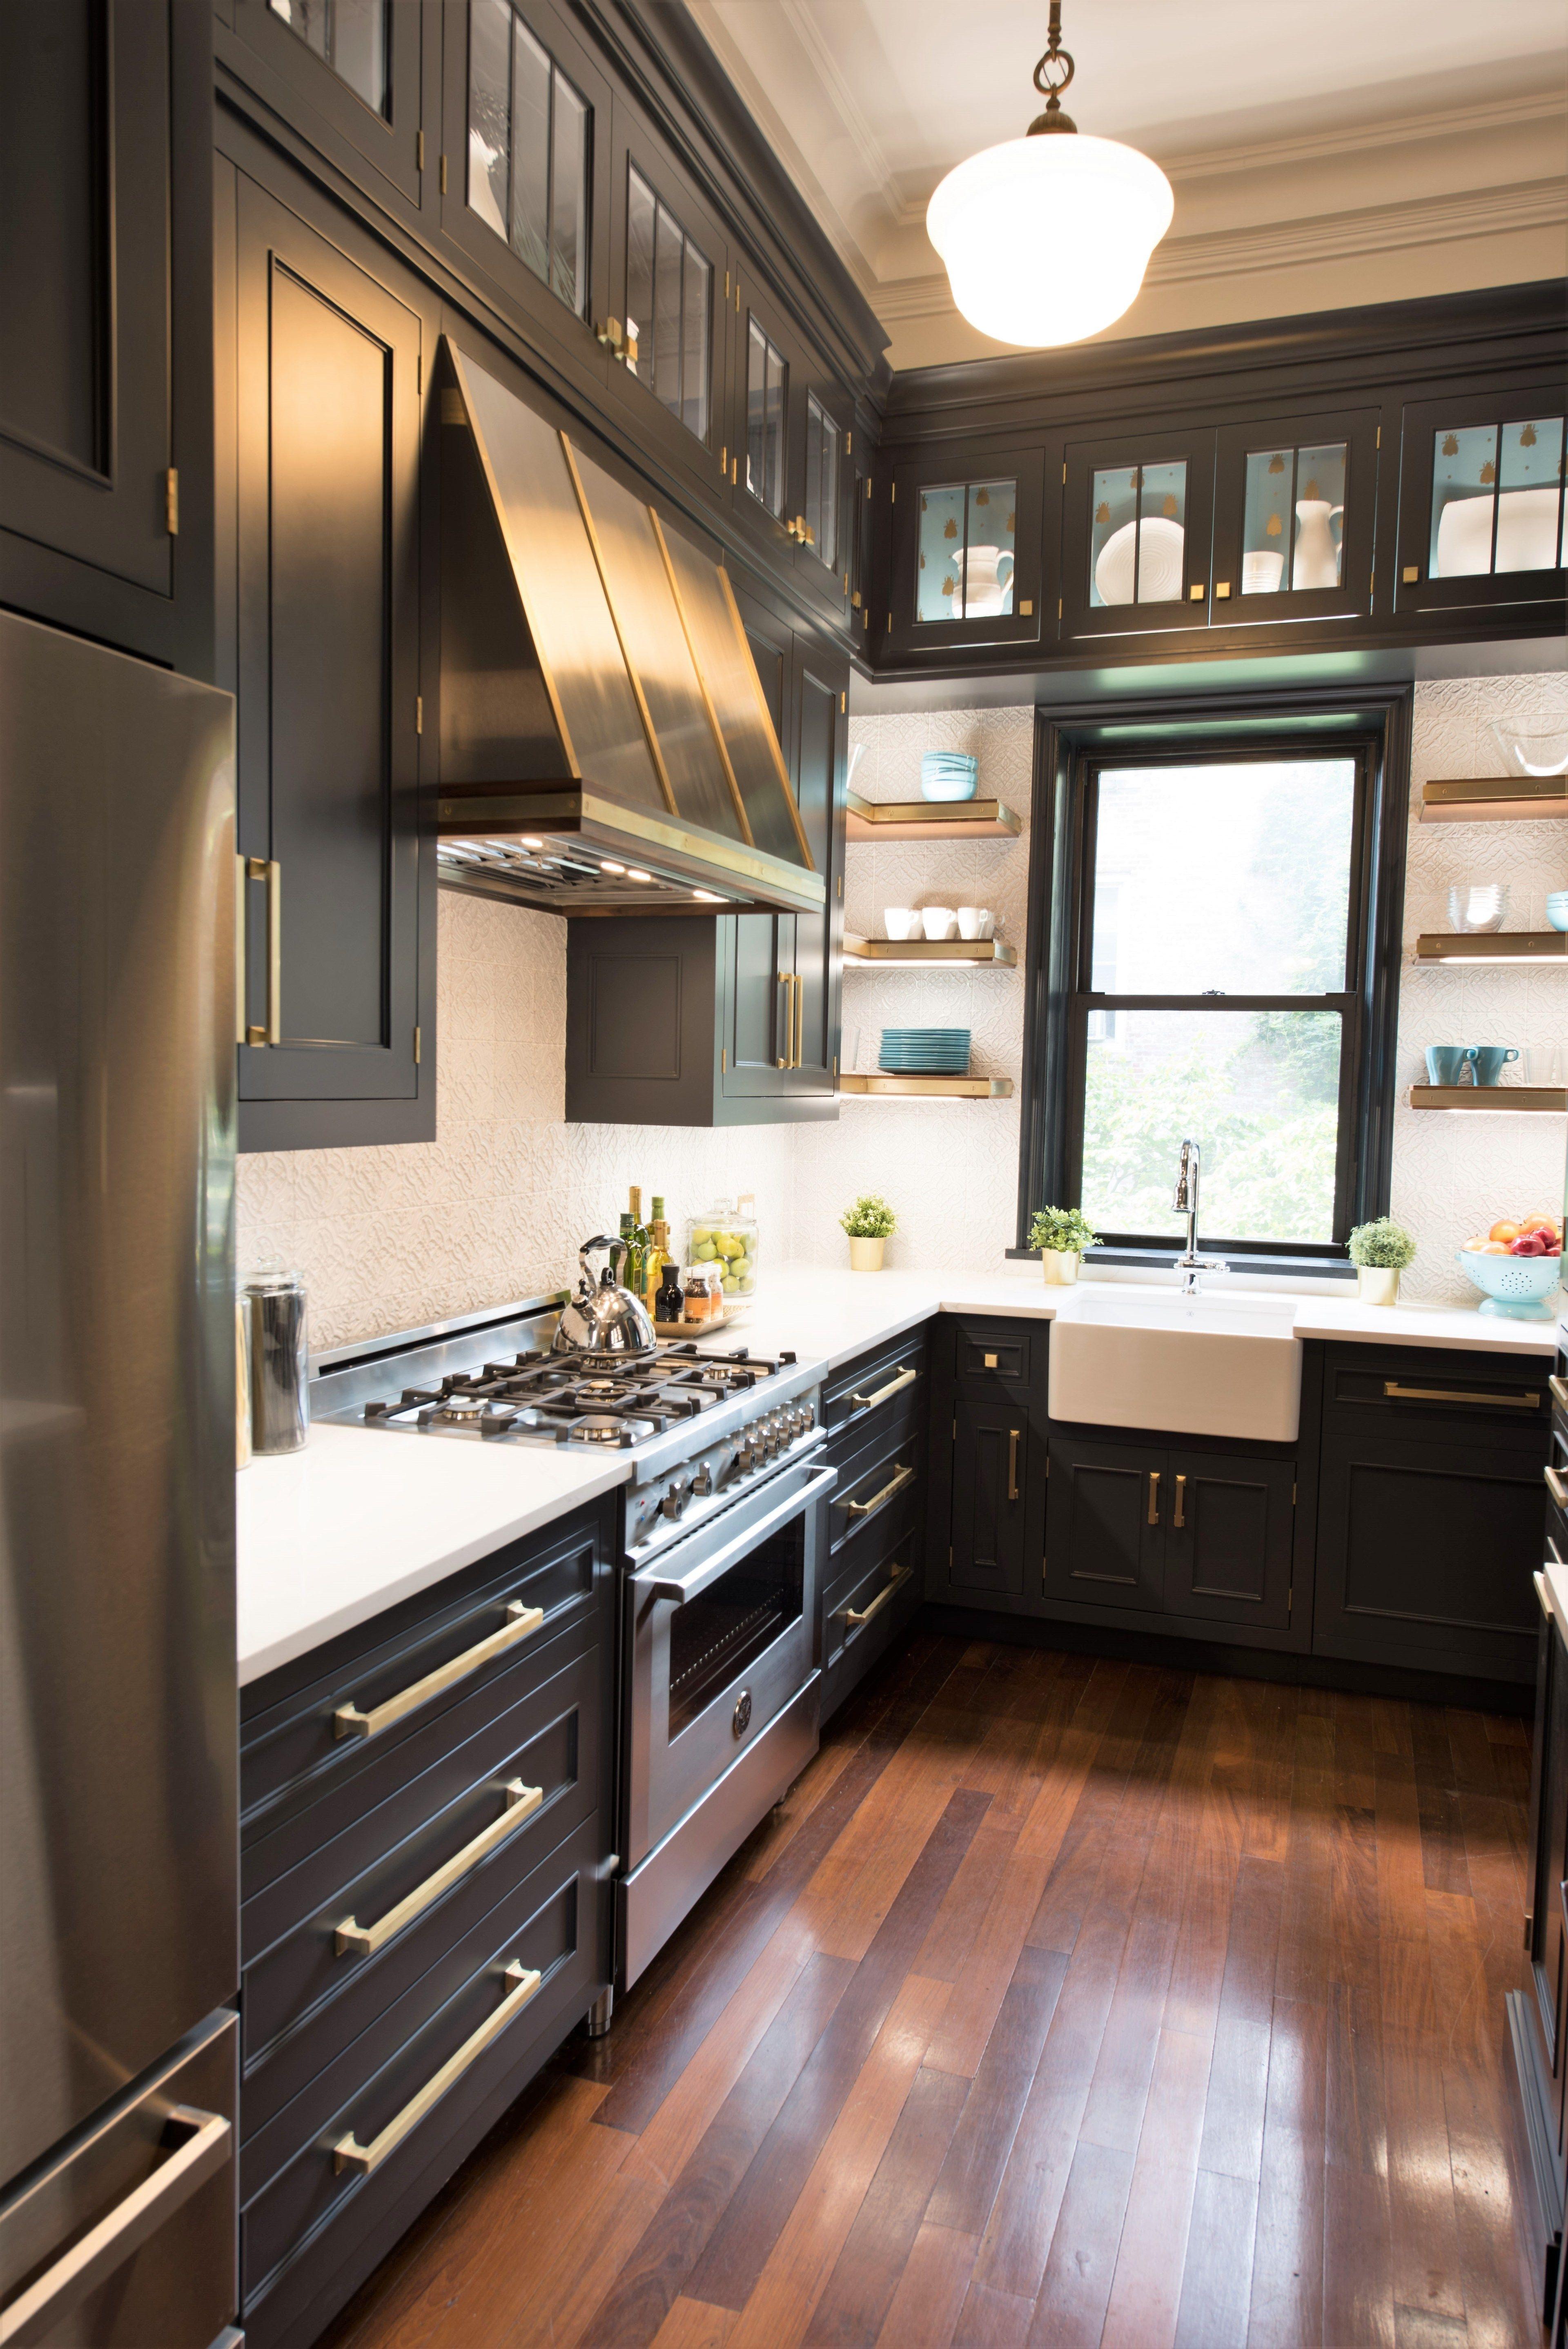 Sarah Baynes Interiors Interior Designer Sarasota Florida In 2020 Lake House Kitchen Kitchen Layout Black Kitchen Cabinets